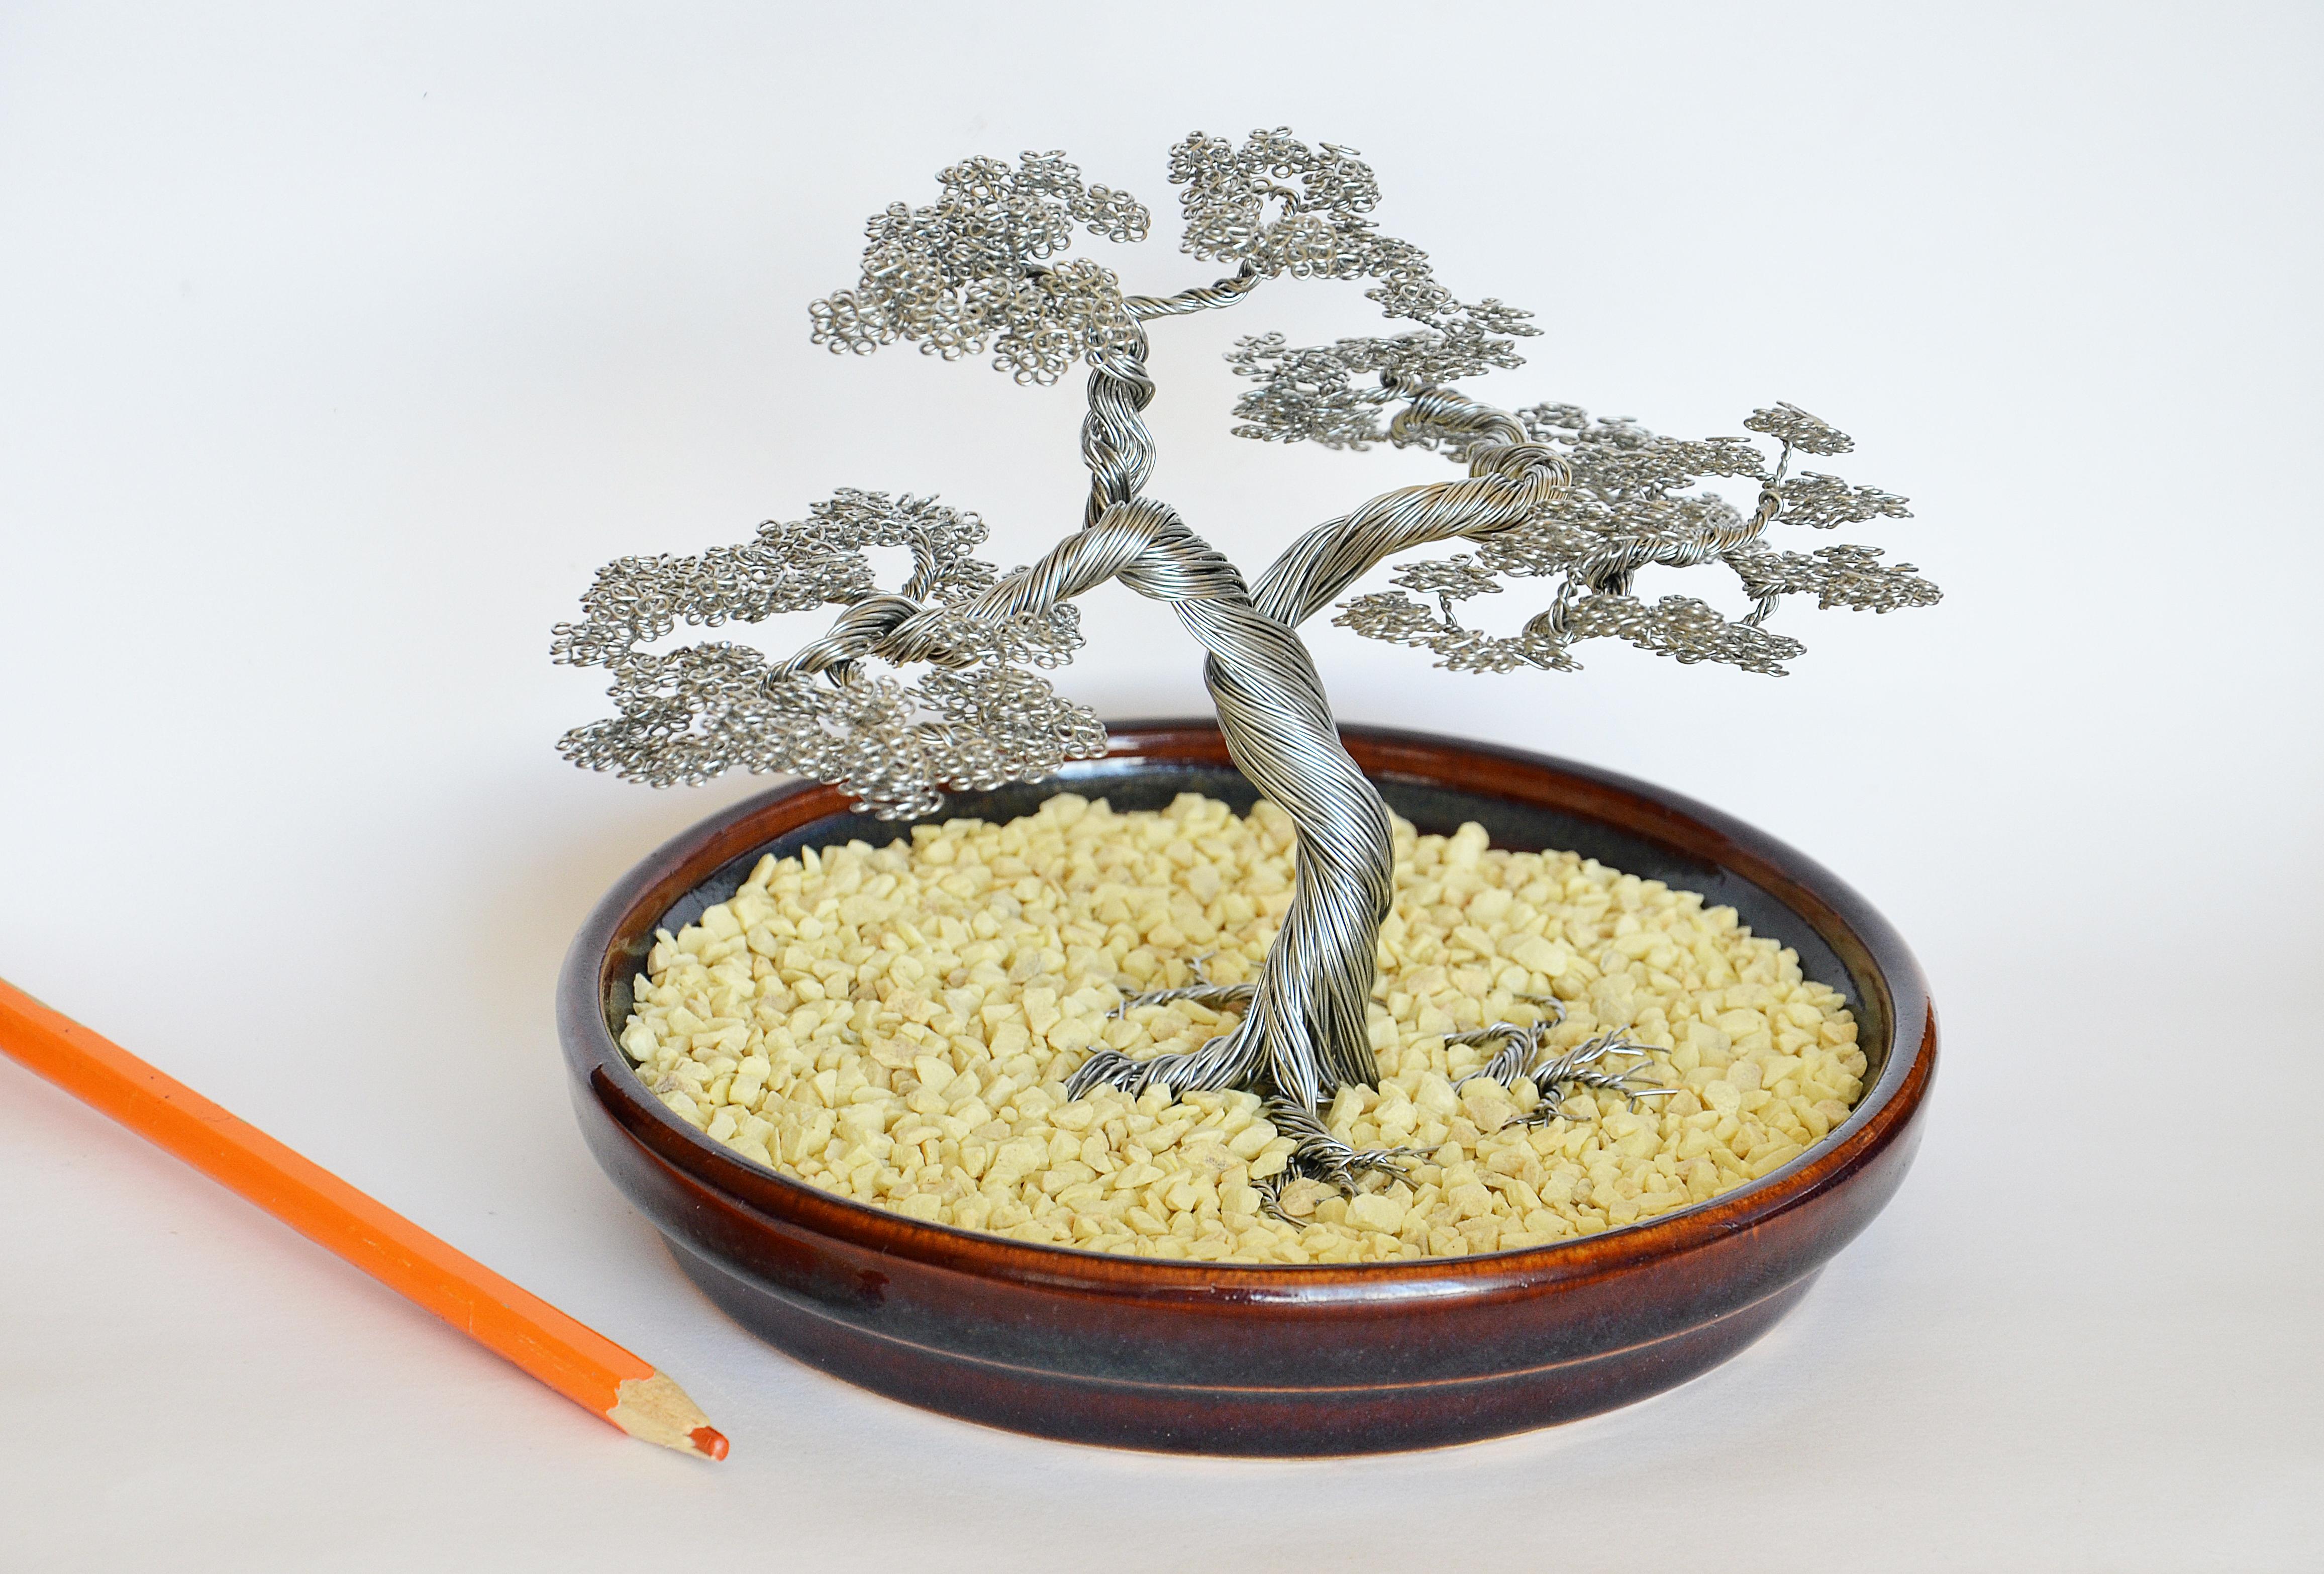 Wire Bonsai Leaf Identification Wiring Diagrams A Tree Sculpture By Minskis On Deviantart Best For Northeast